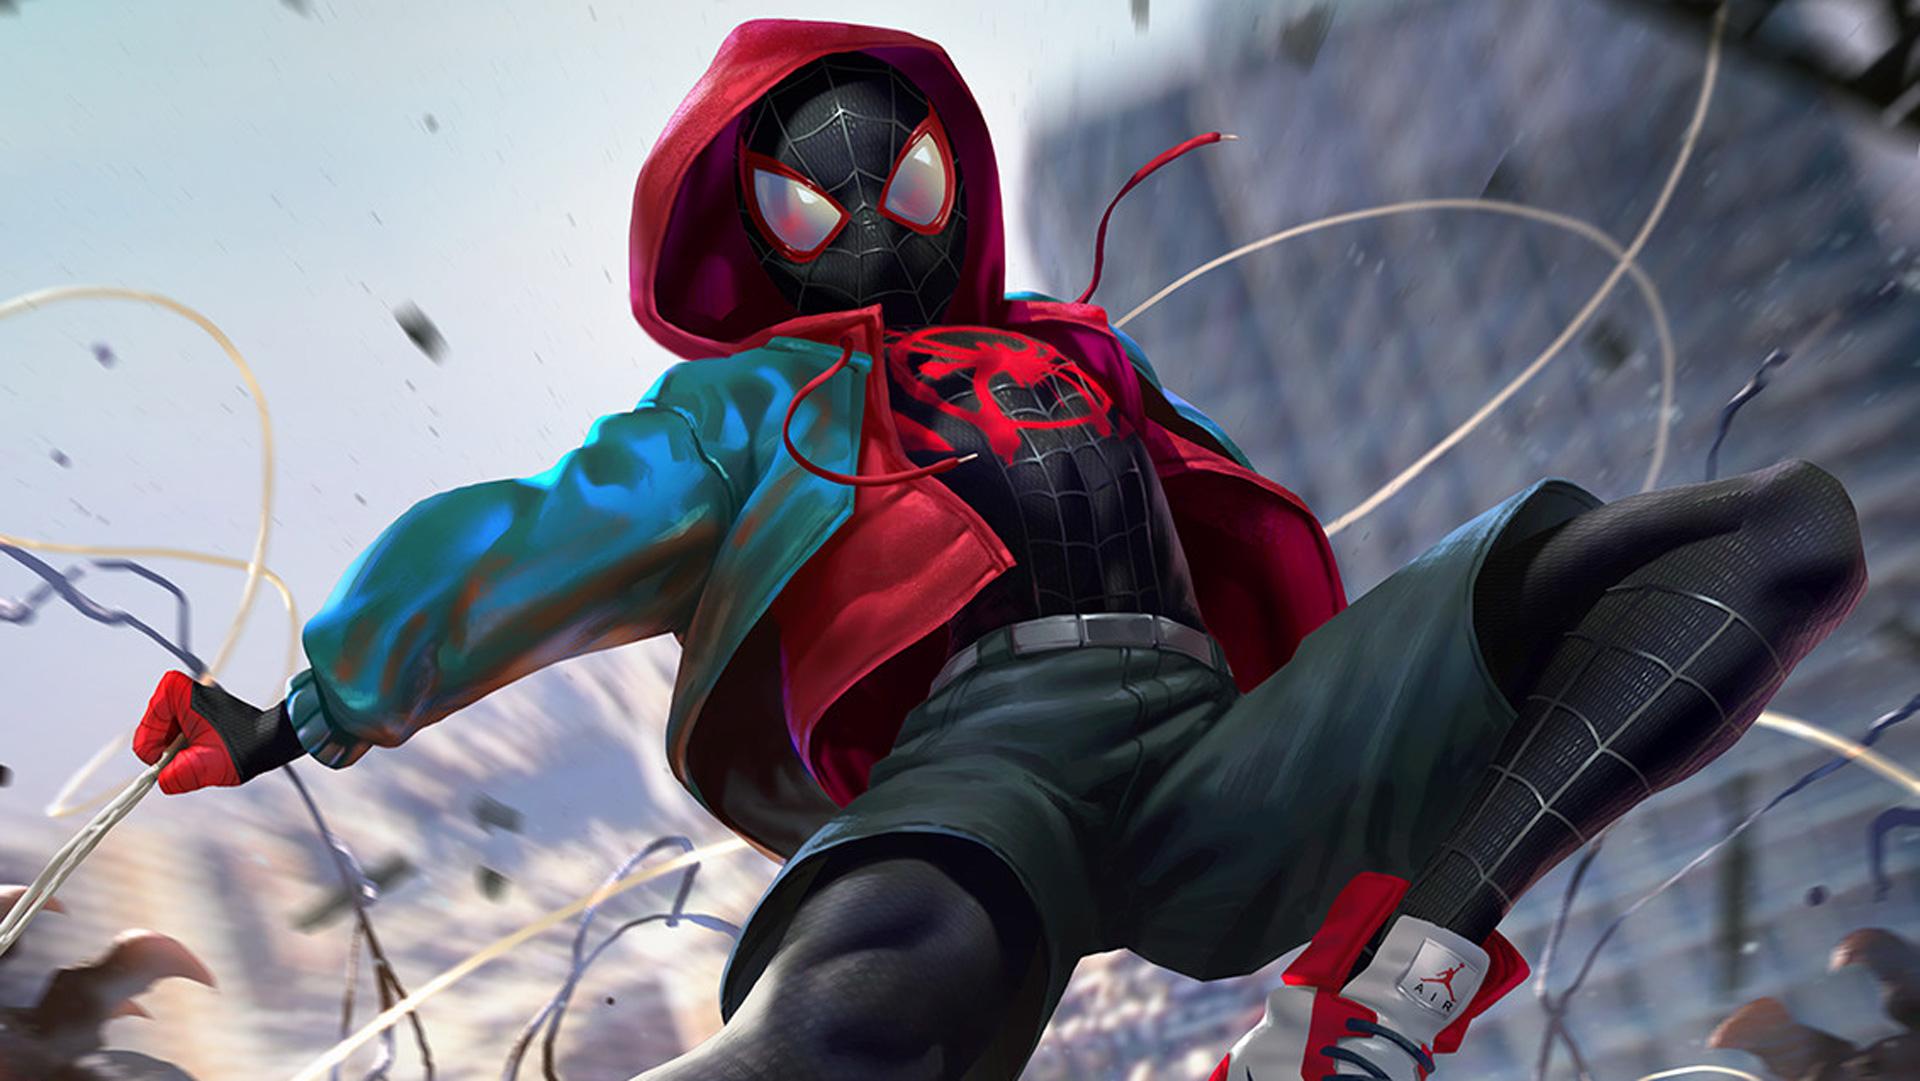 spiderman into the spider verse digital art 2018 hd